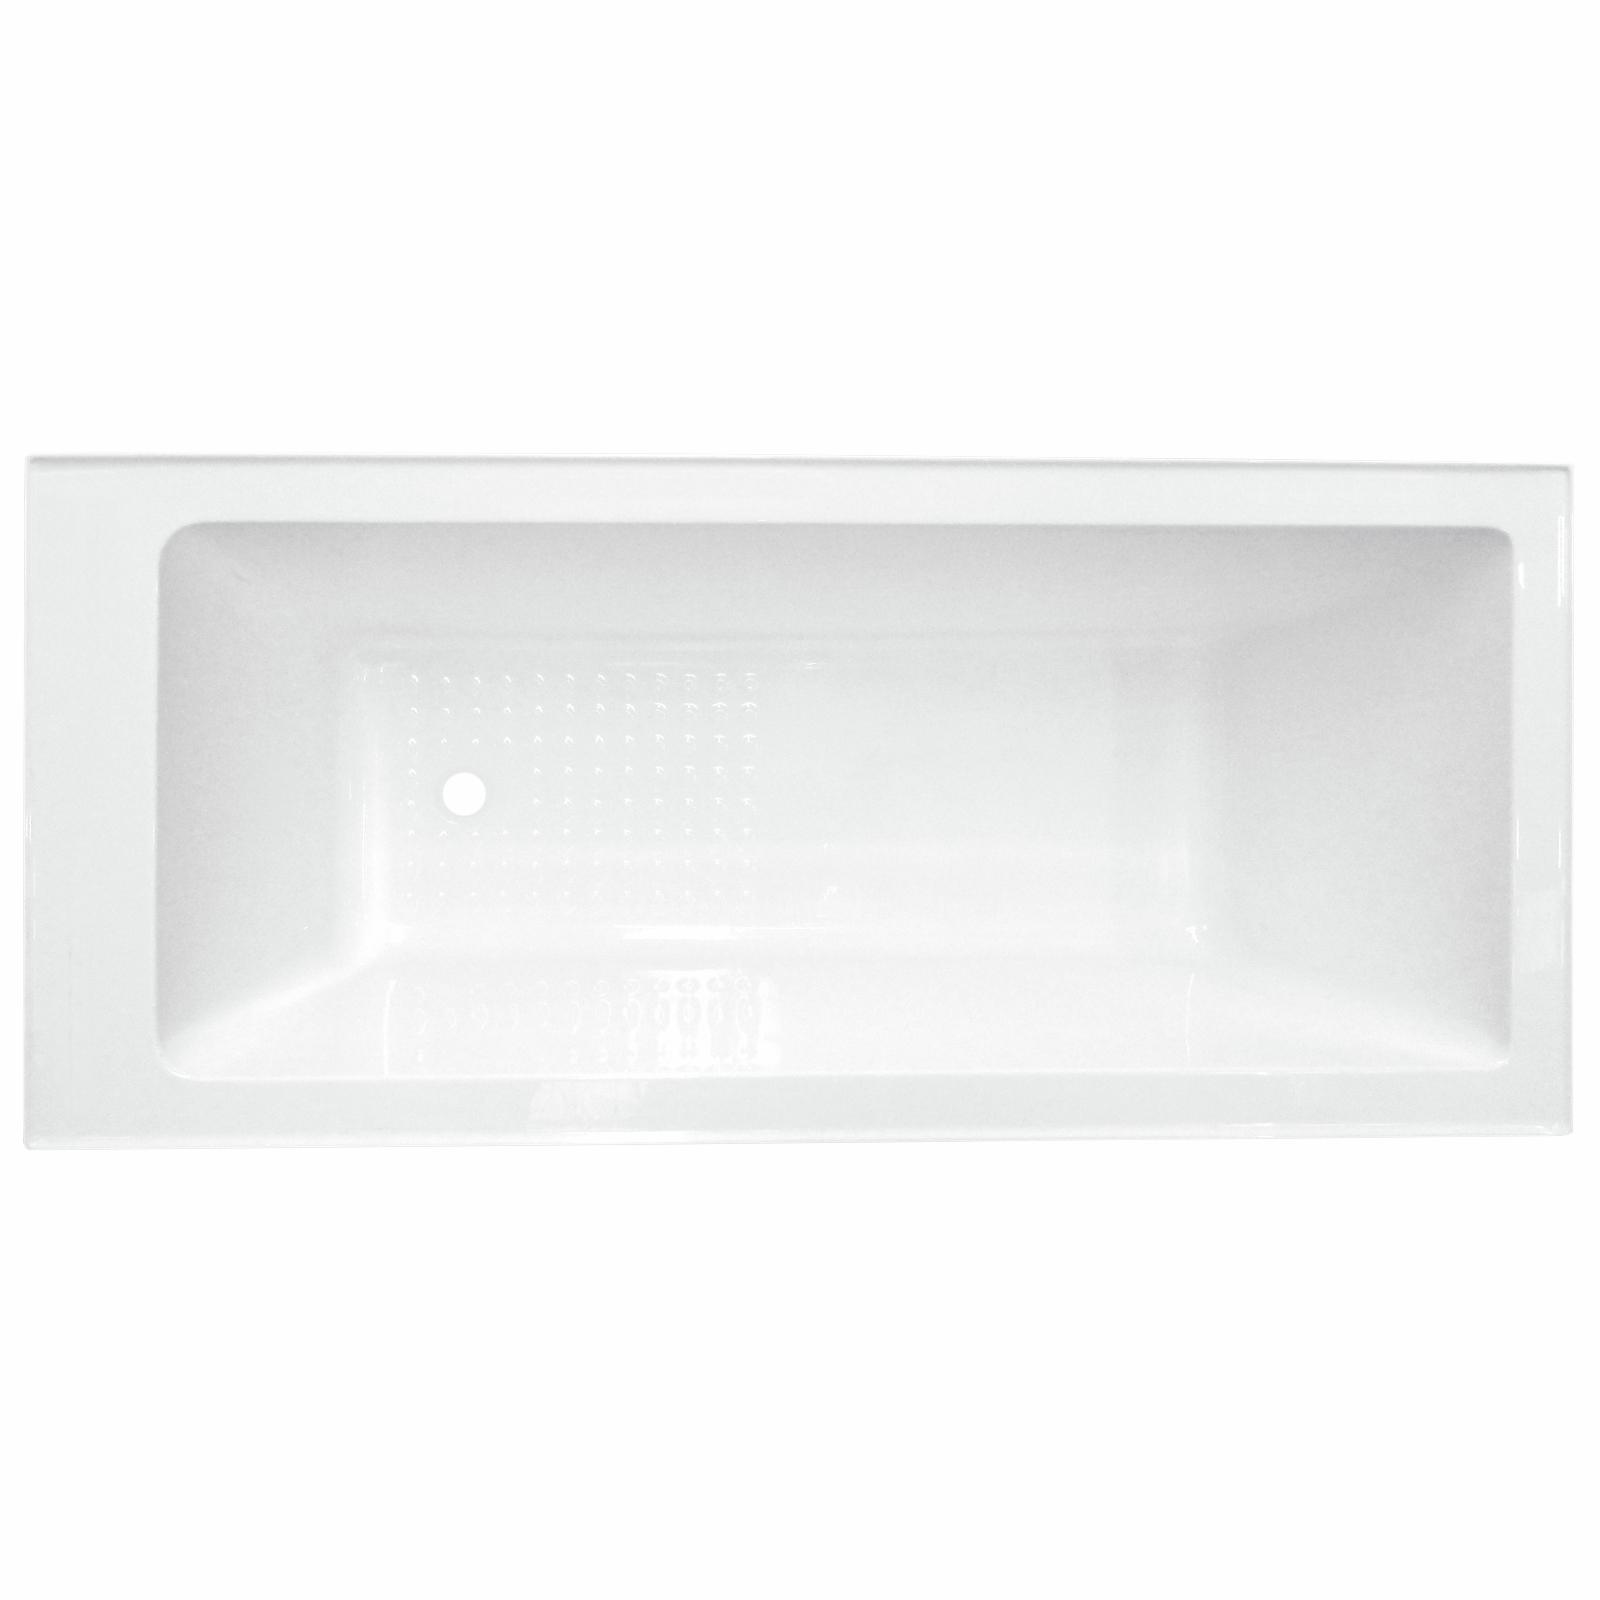 Mondella 1675mm White Gloss Resonance Acrylic Bathtub